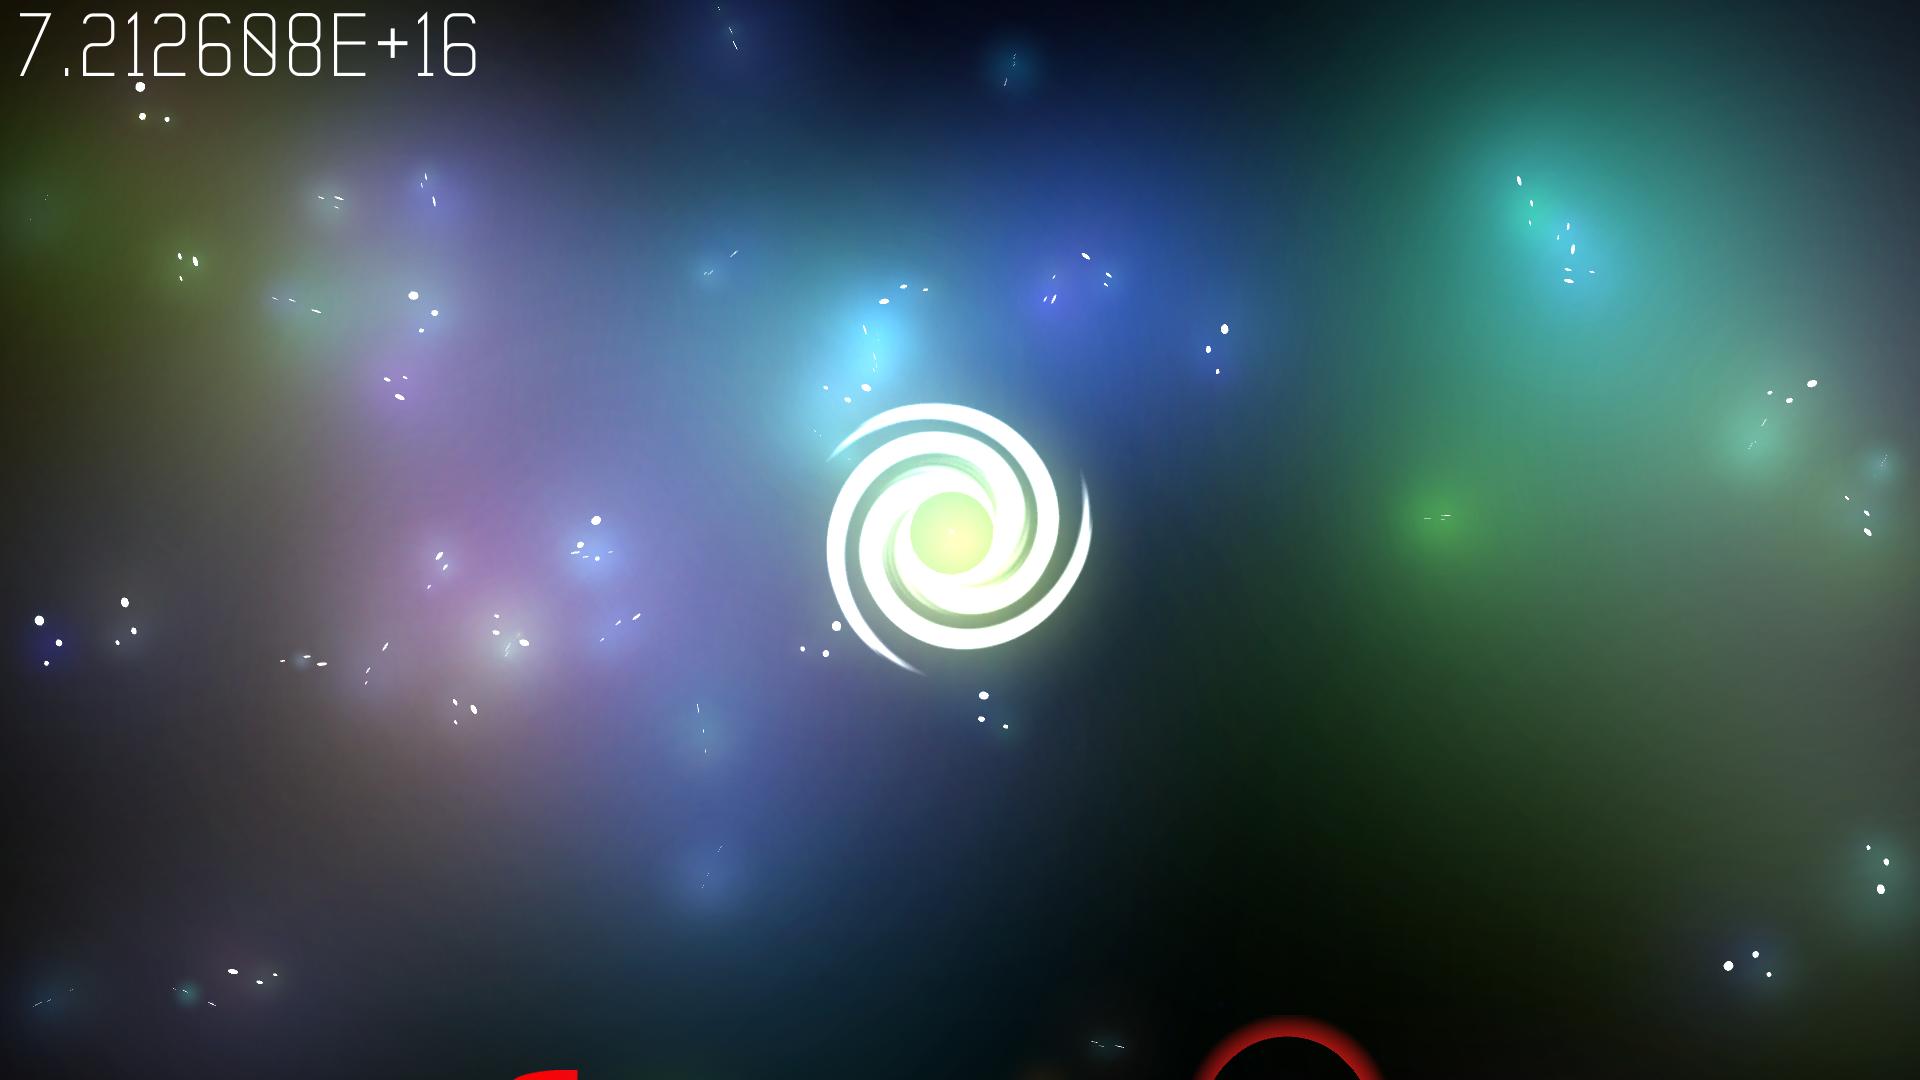 Screenshot 2015 10 22 21 07 22